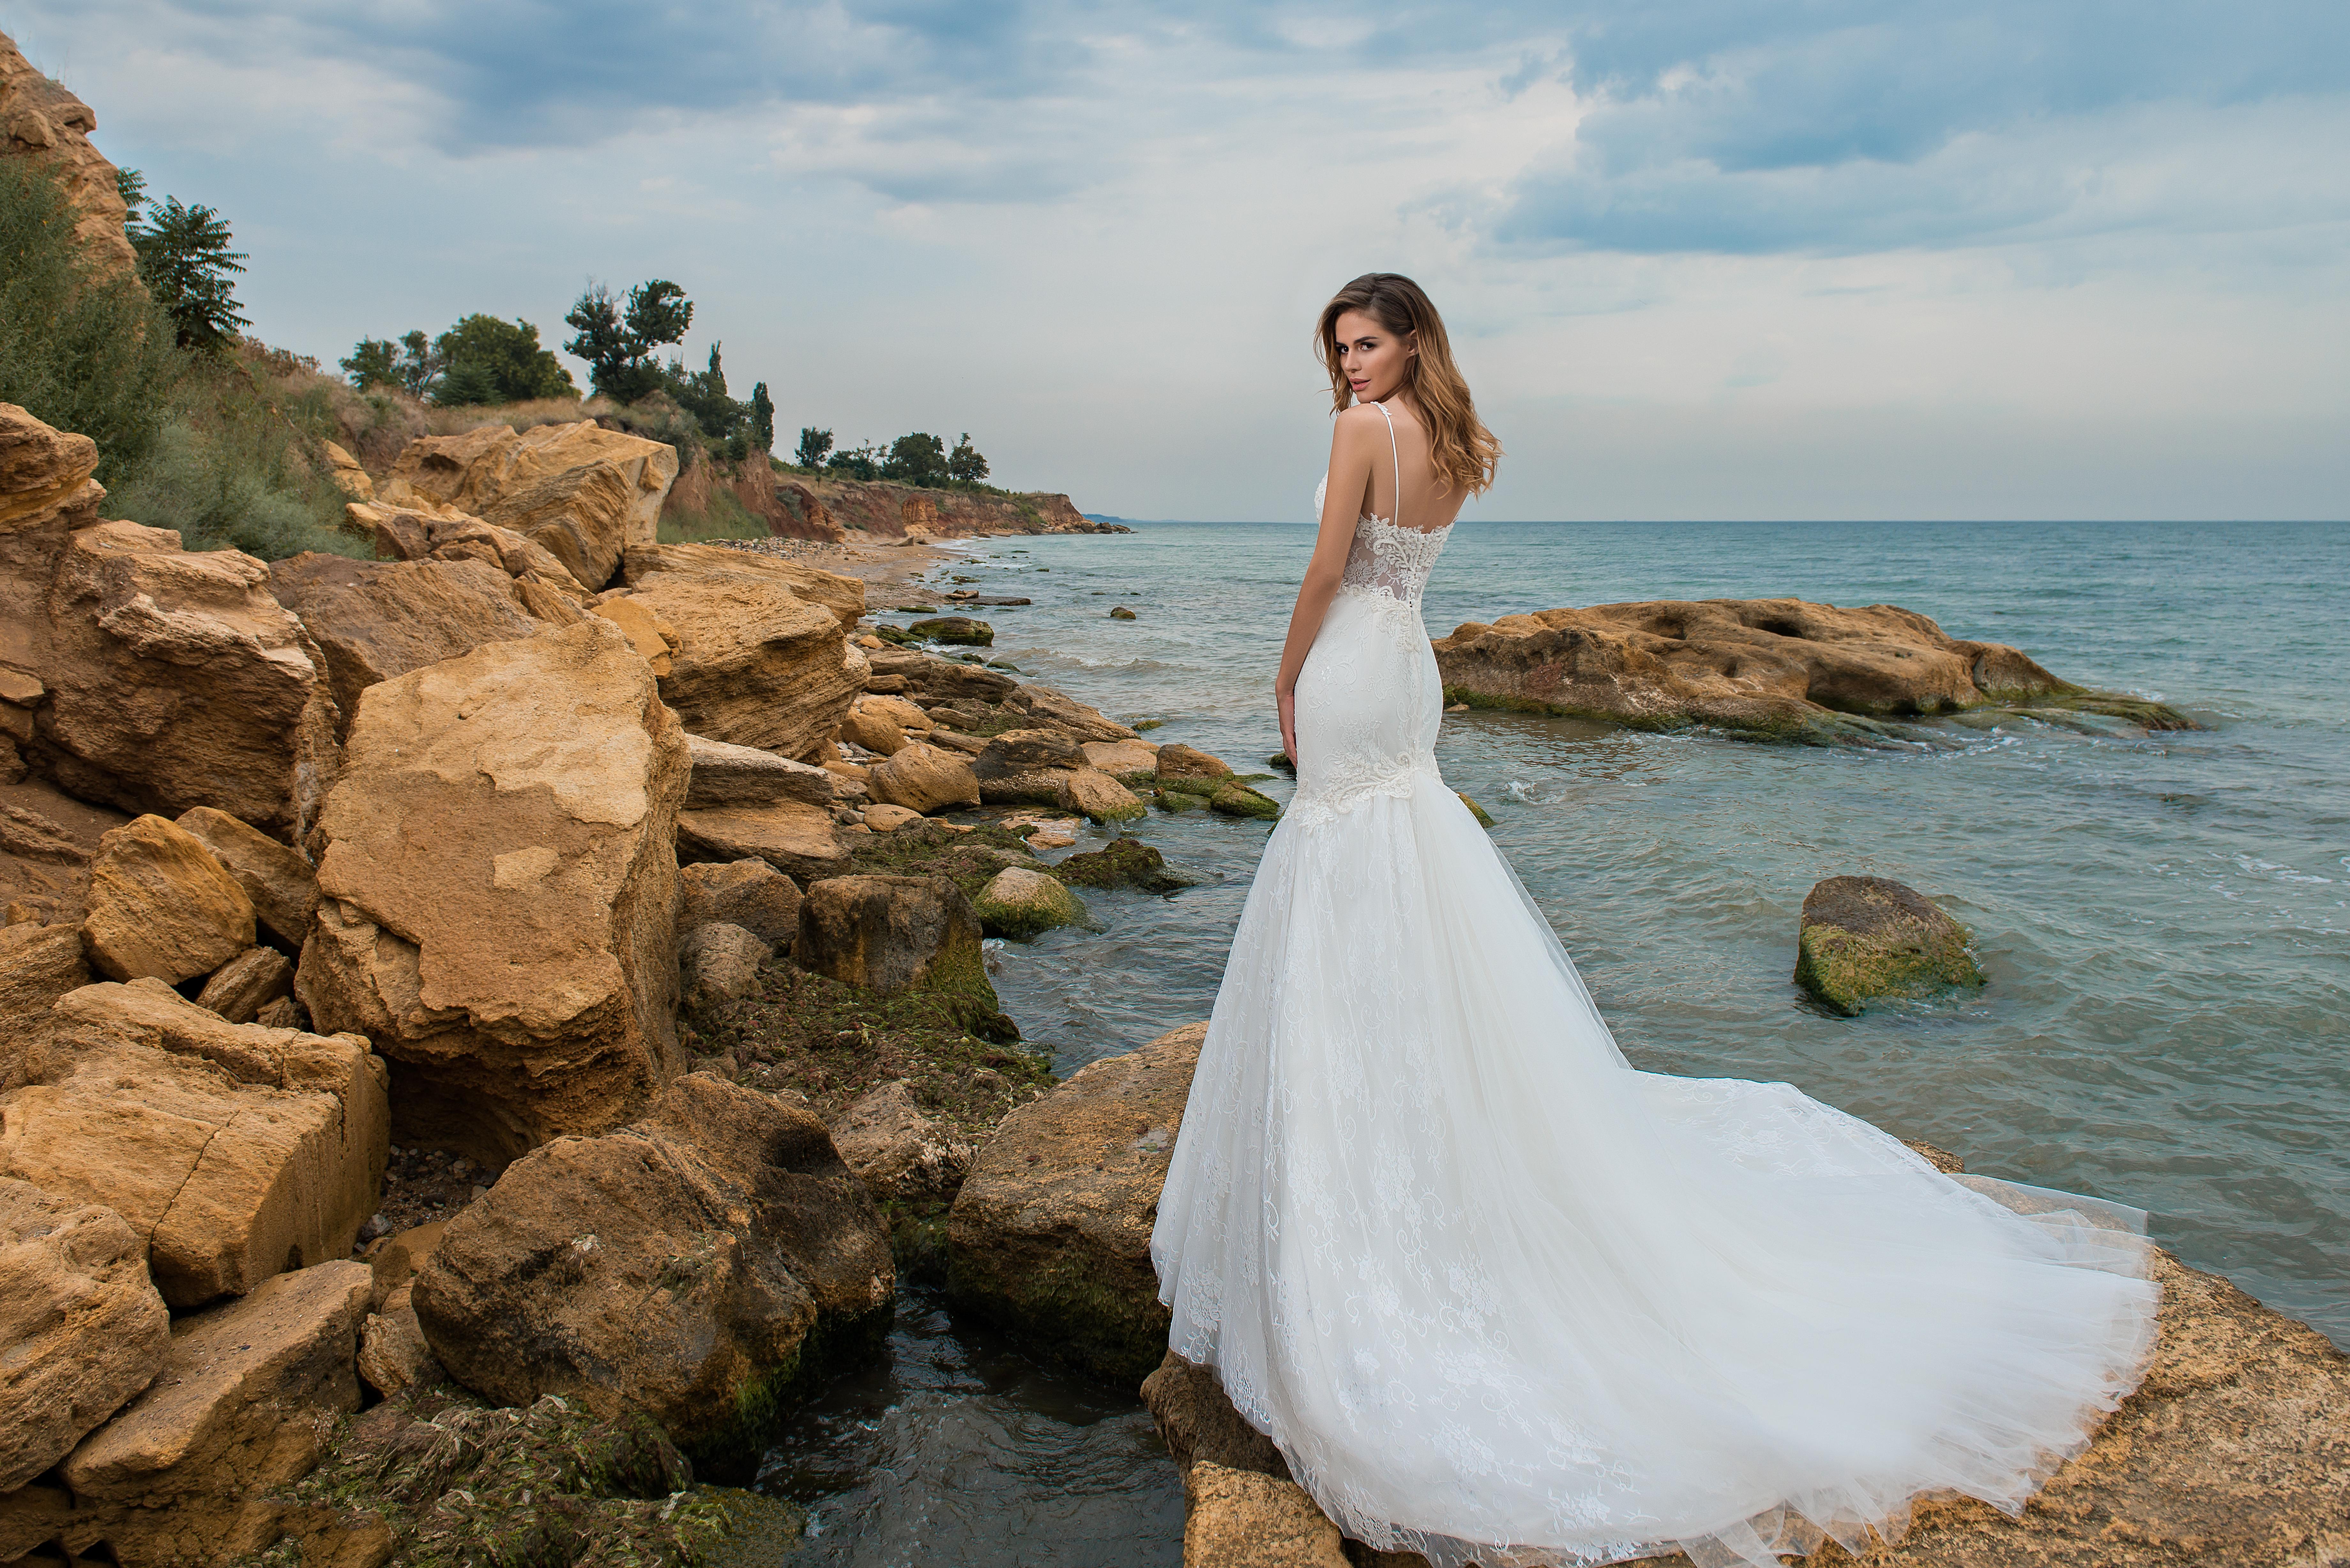 Fish wedding dress on straps-1